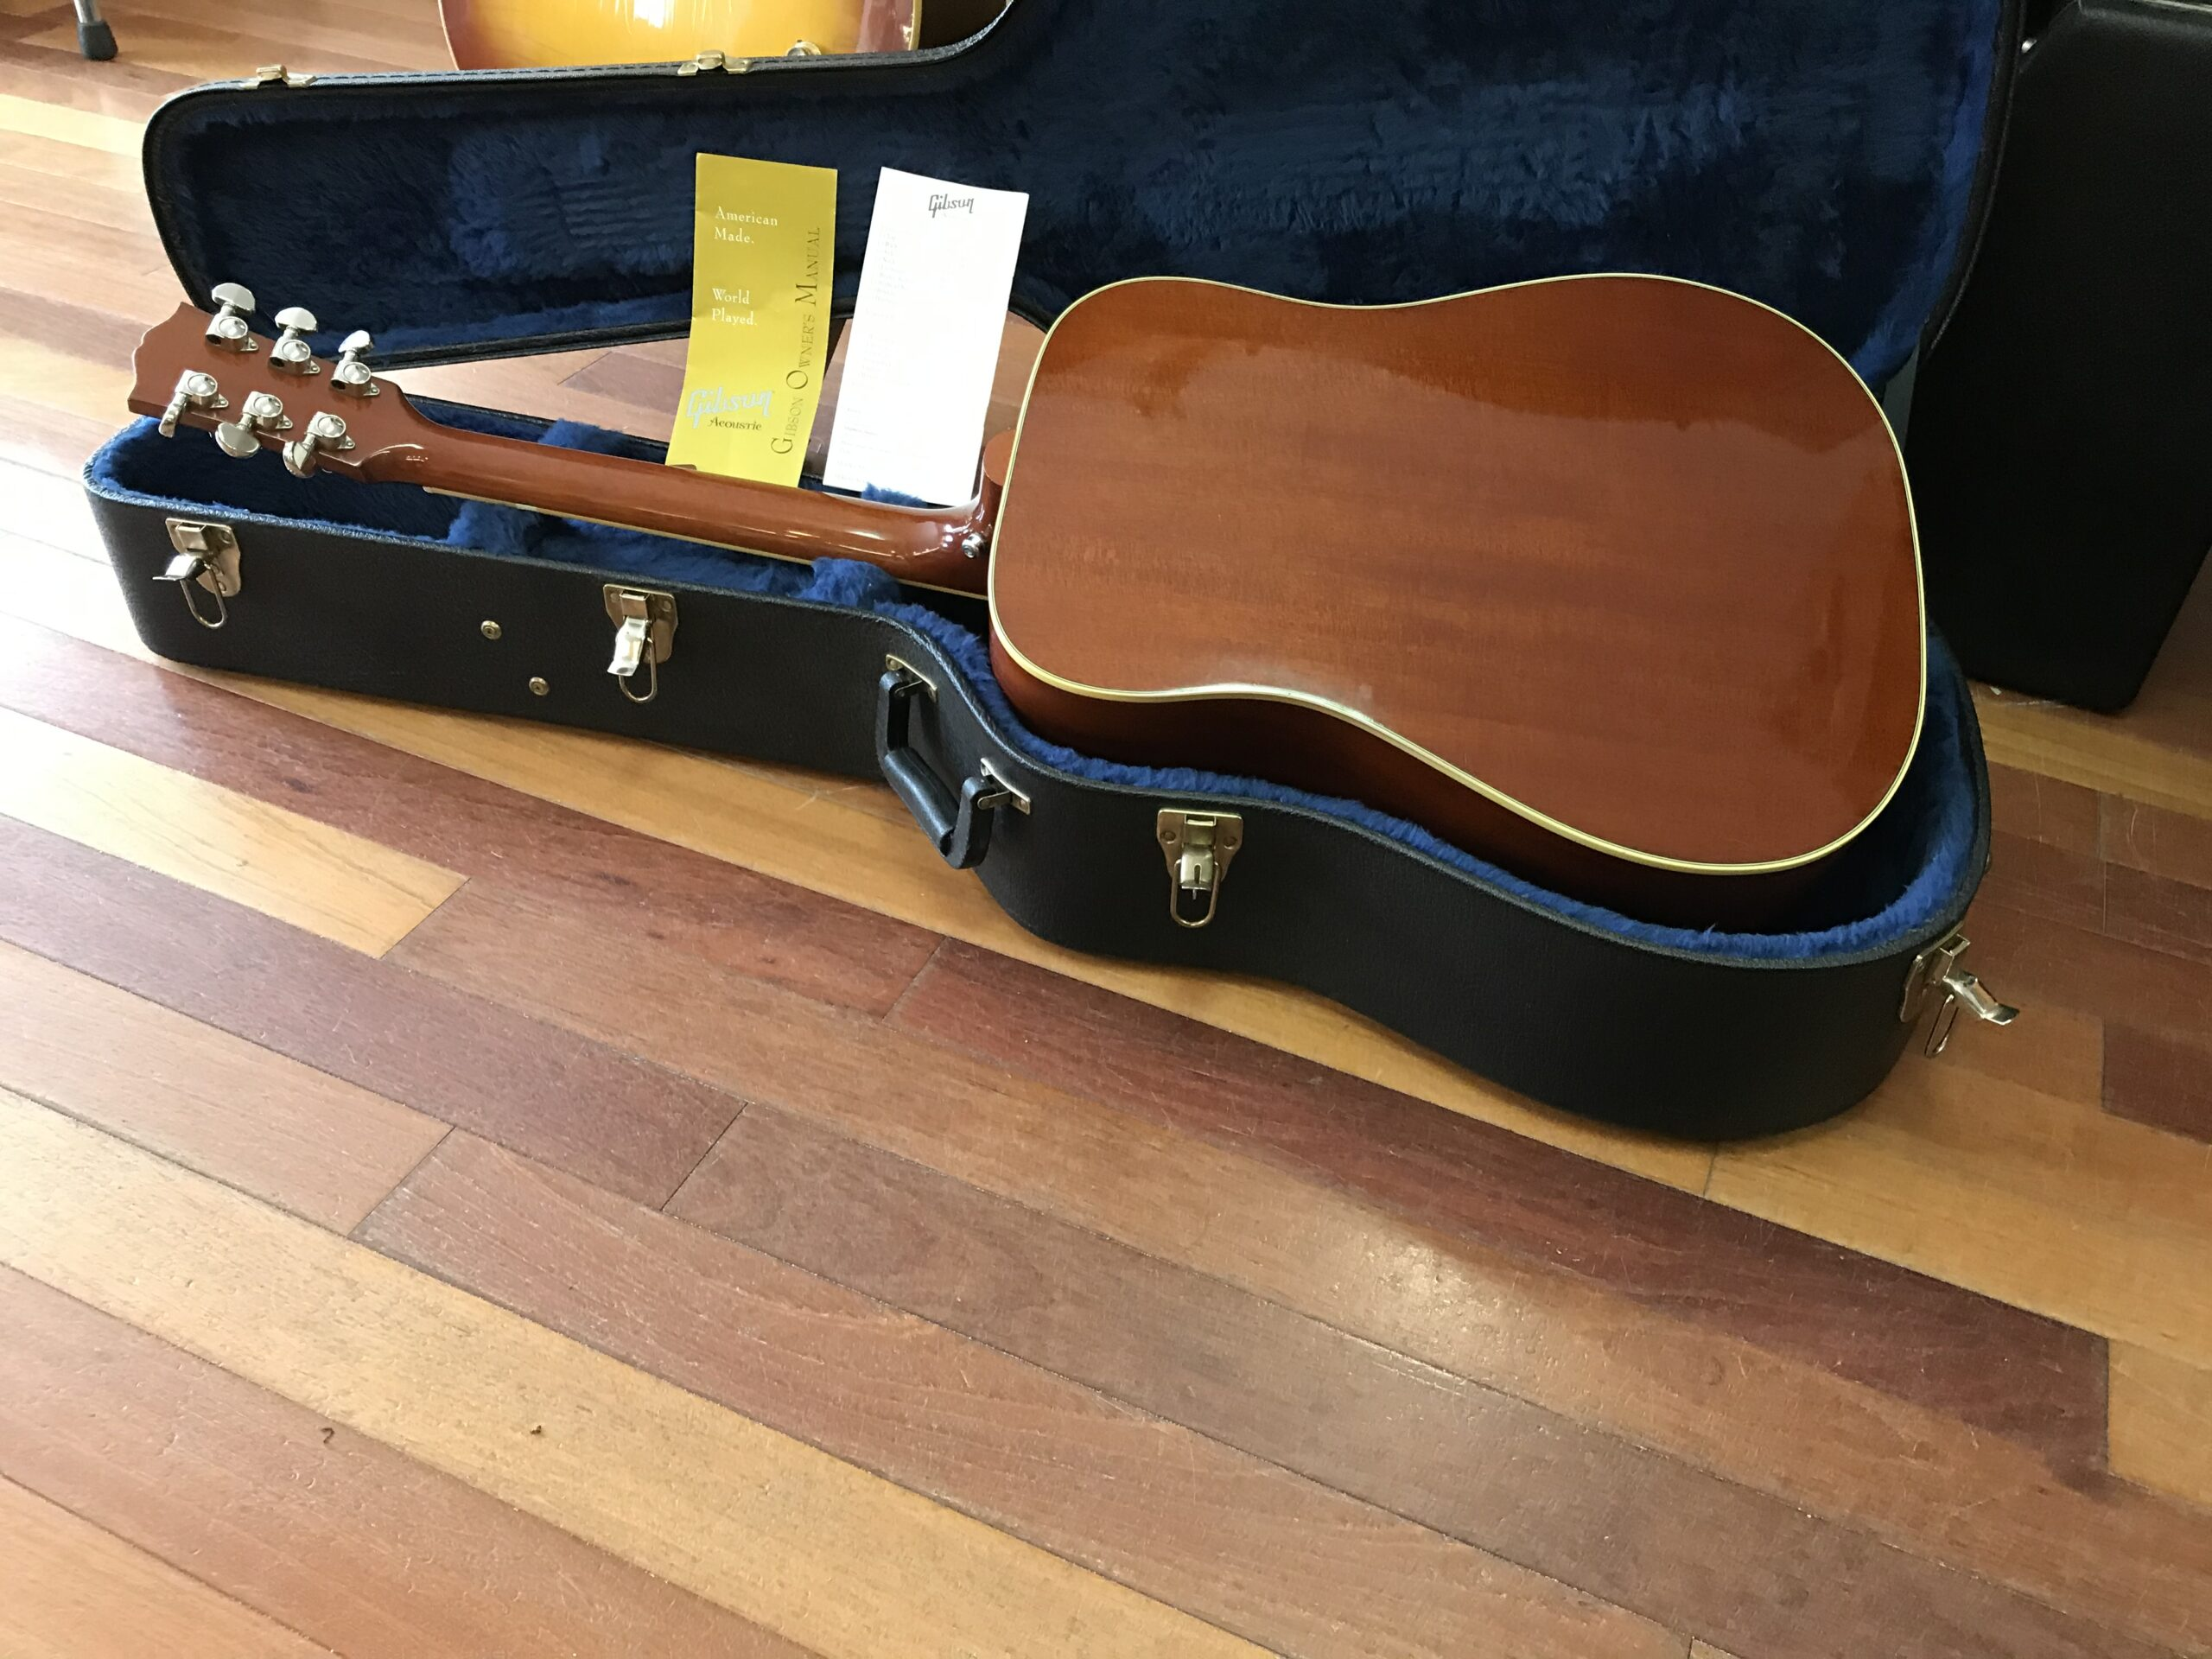 2010 Gibson Hummingbird